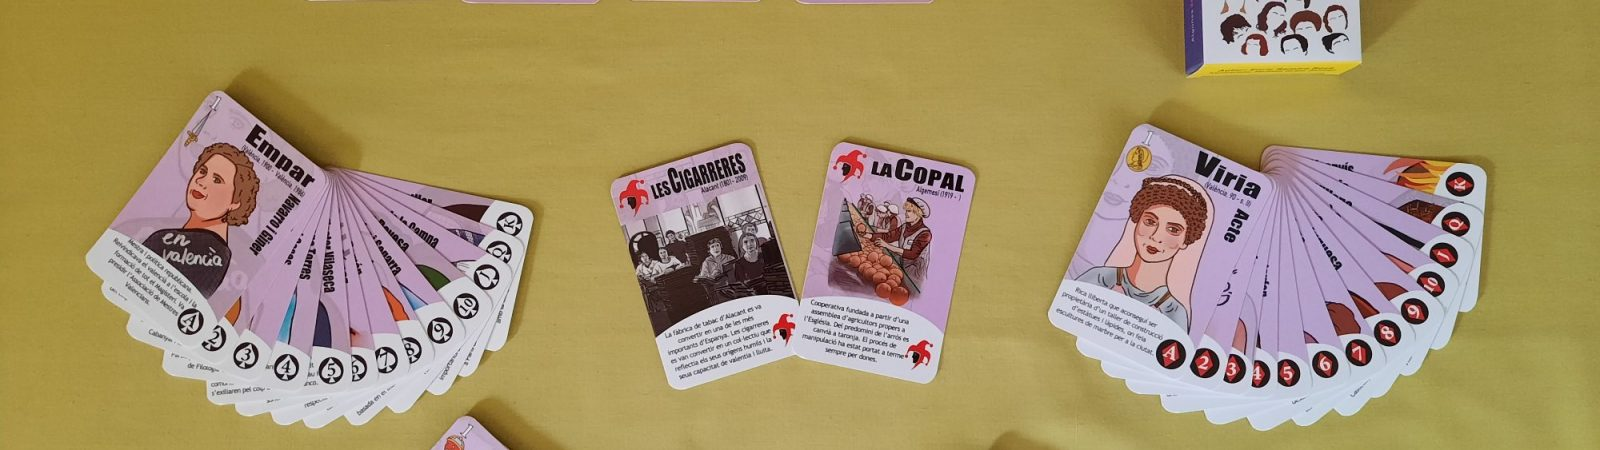 El profesor de la UJI Enric Ramiro y la filóloga Meritxell Girbés han creado esta baraja.